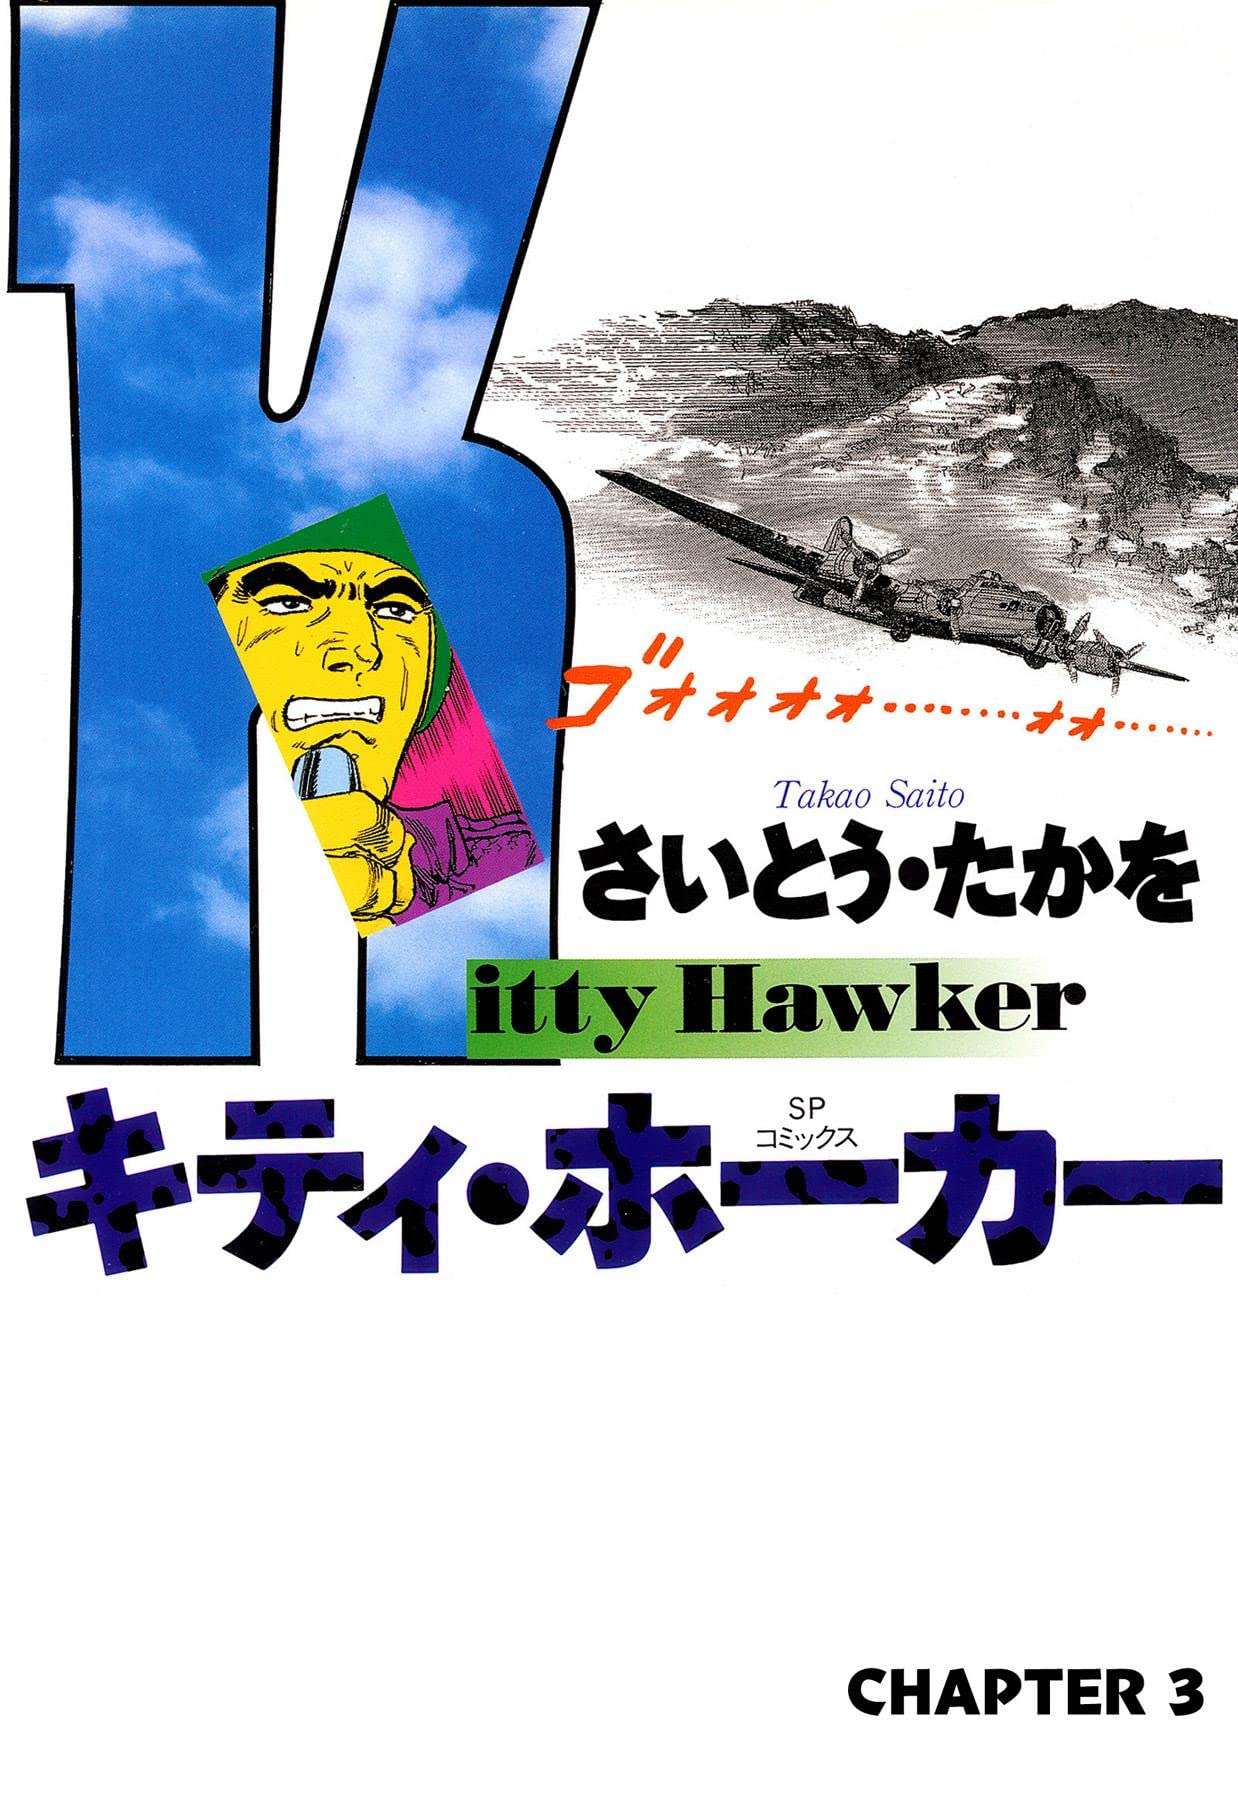 Kitty Hawker #3